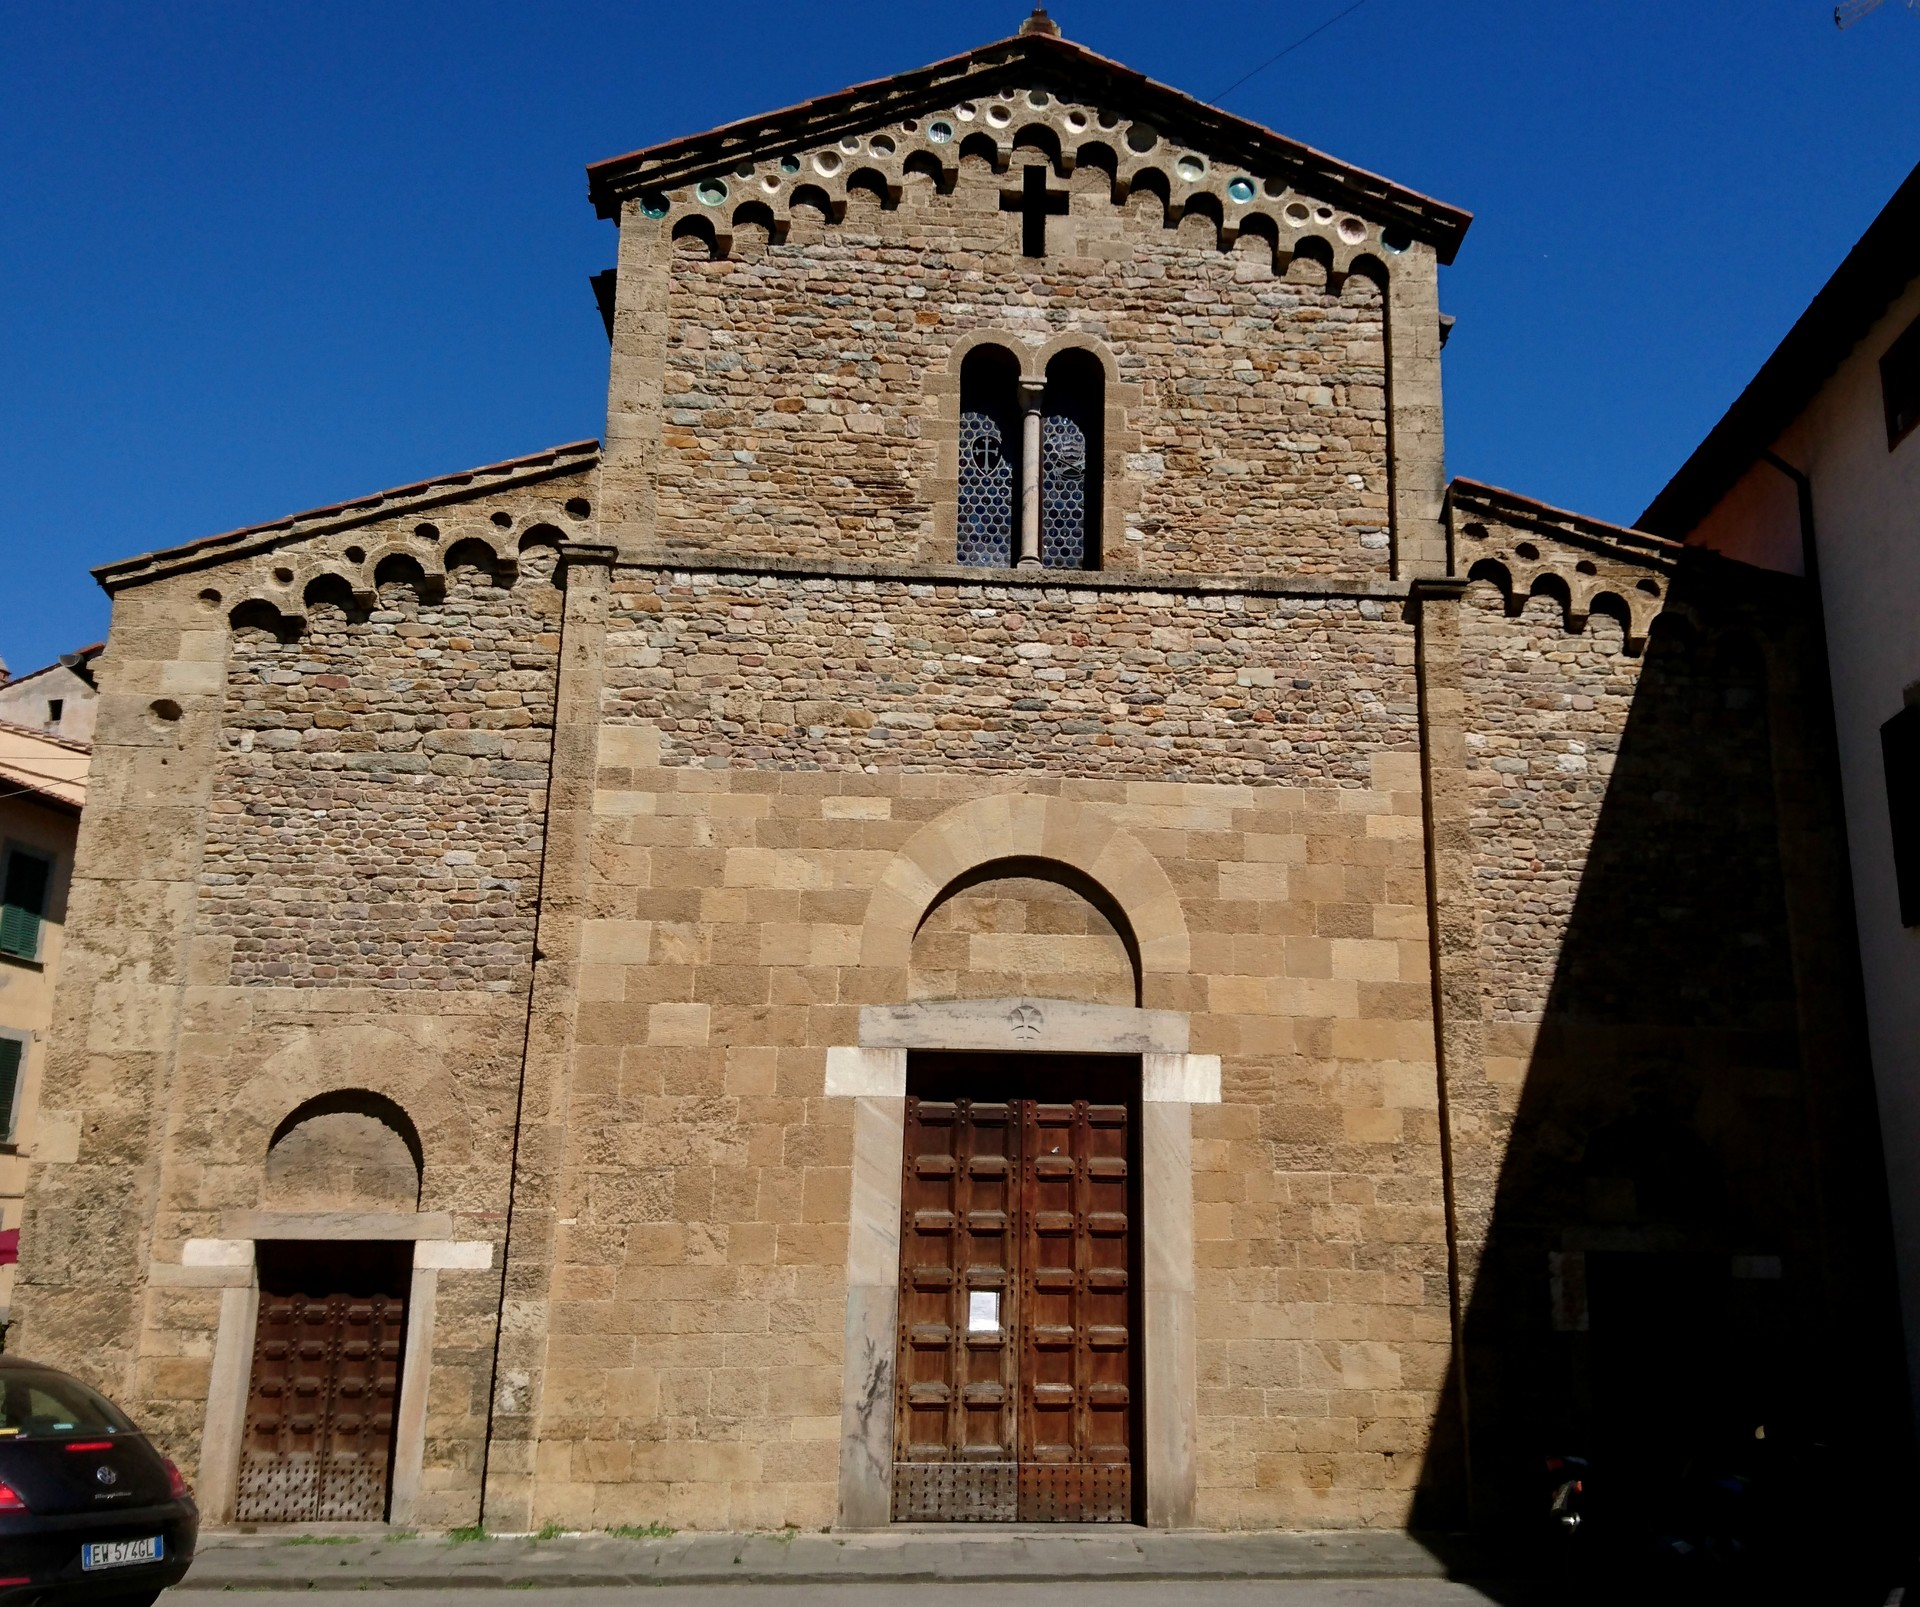 churches-beauty-6b6dc43e12b9059d4669d2c9